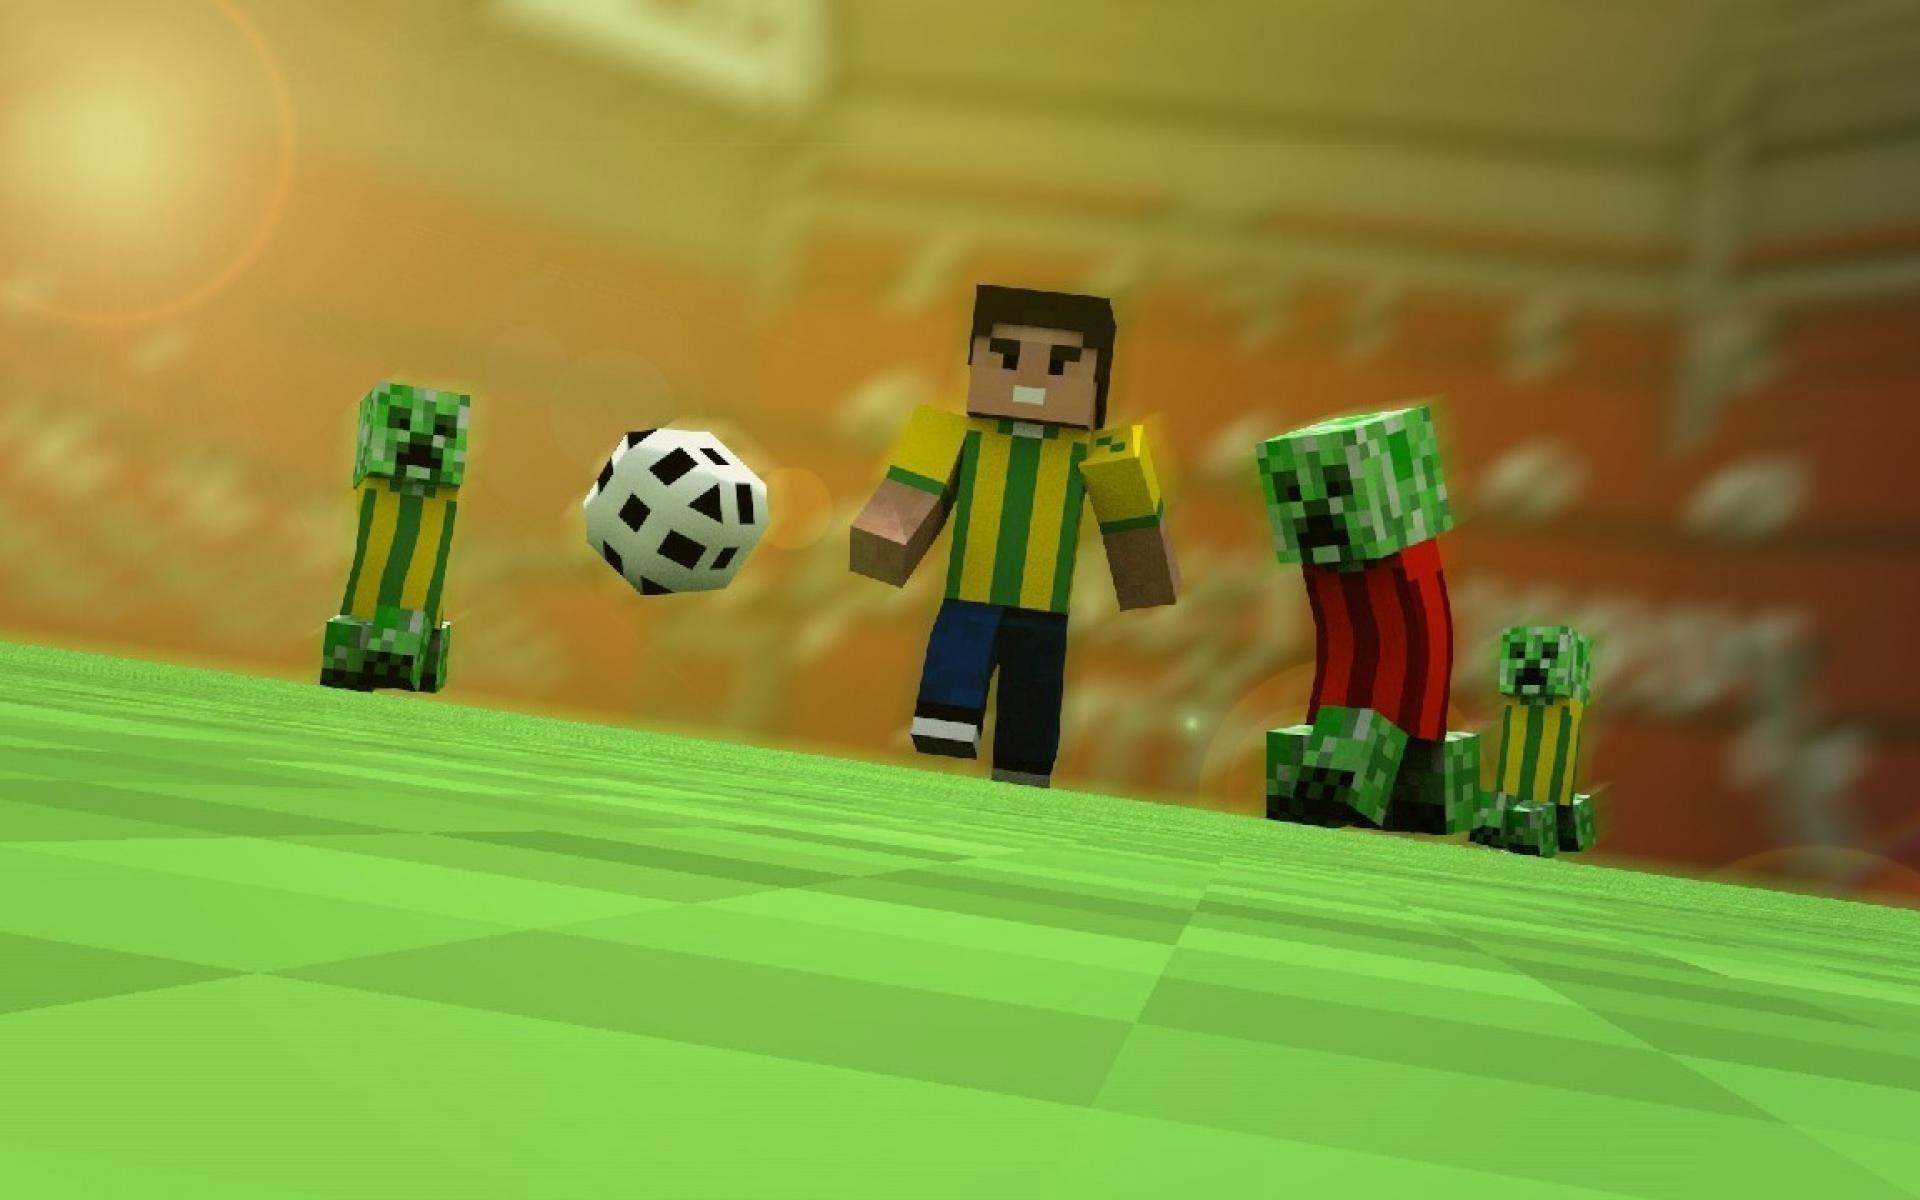 wallpaper.wiki-Cool-Soccer-Desktop-Picture-PIC-WPD003589